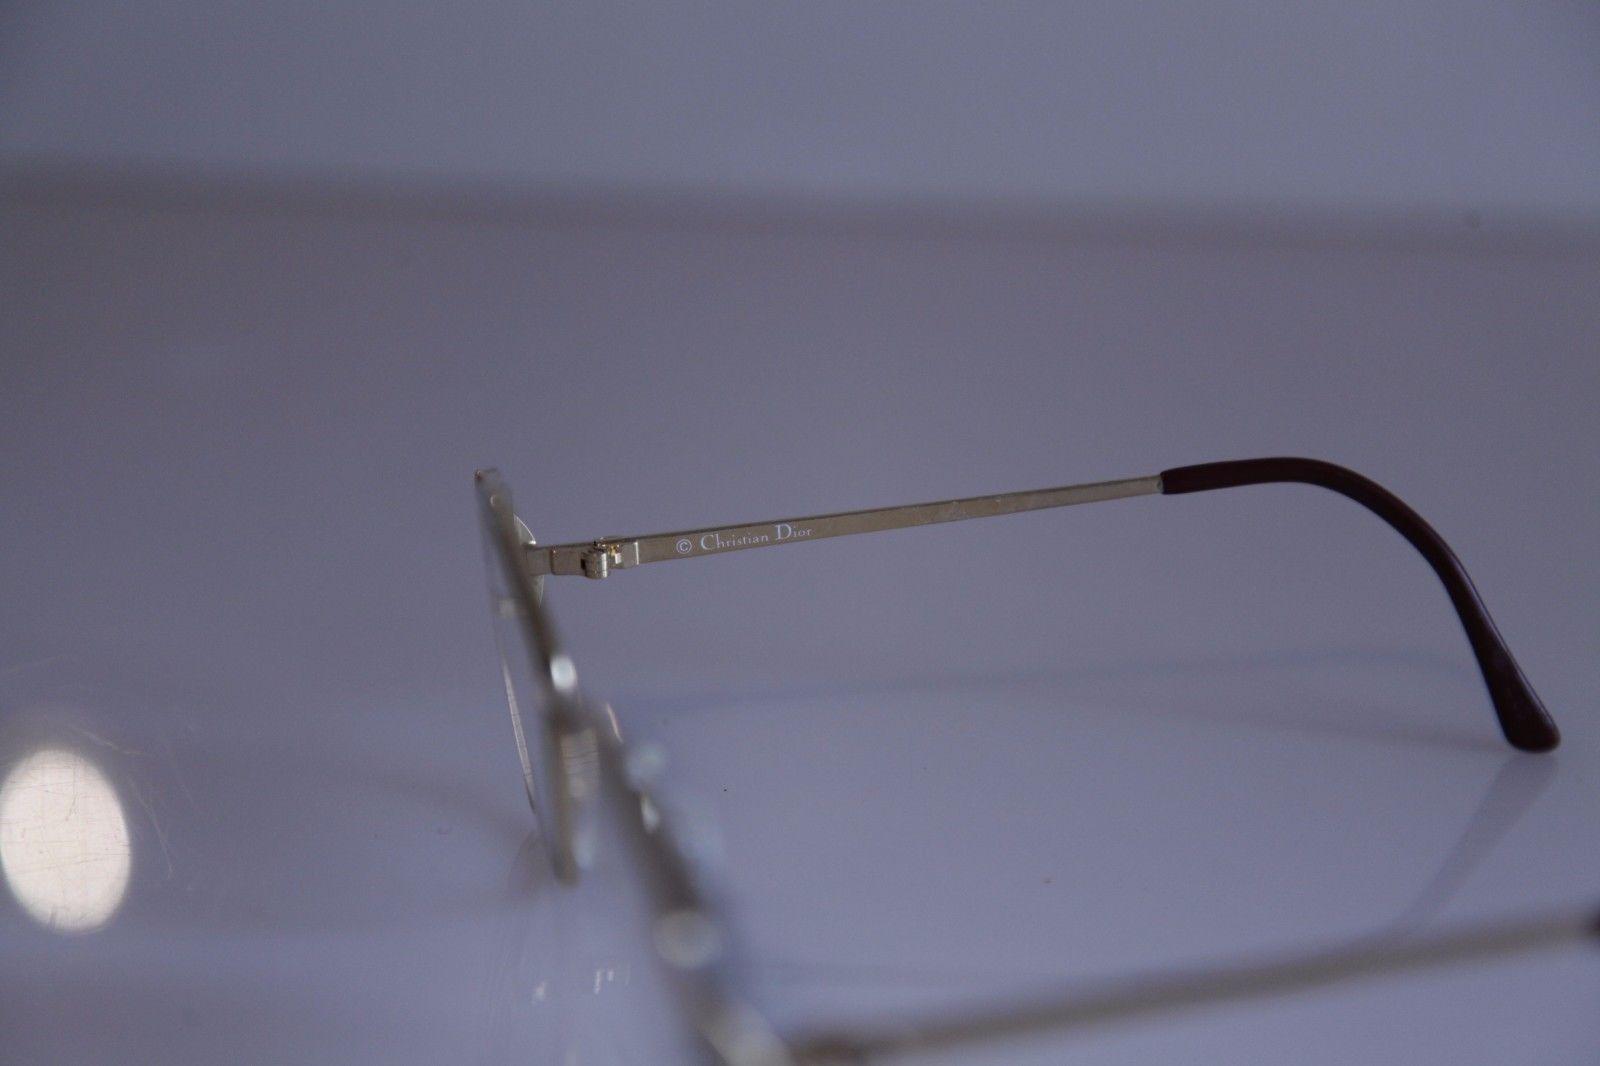 Vintage CHRISTIAN DIOR Eyewear, Gold Frame, RX-Able Prescription lens. Austria 2